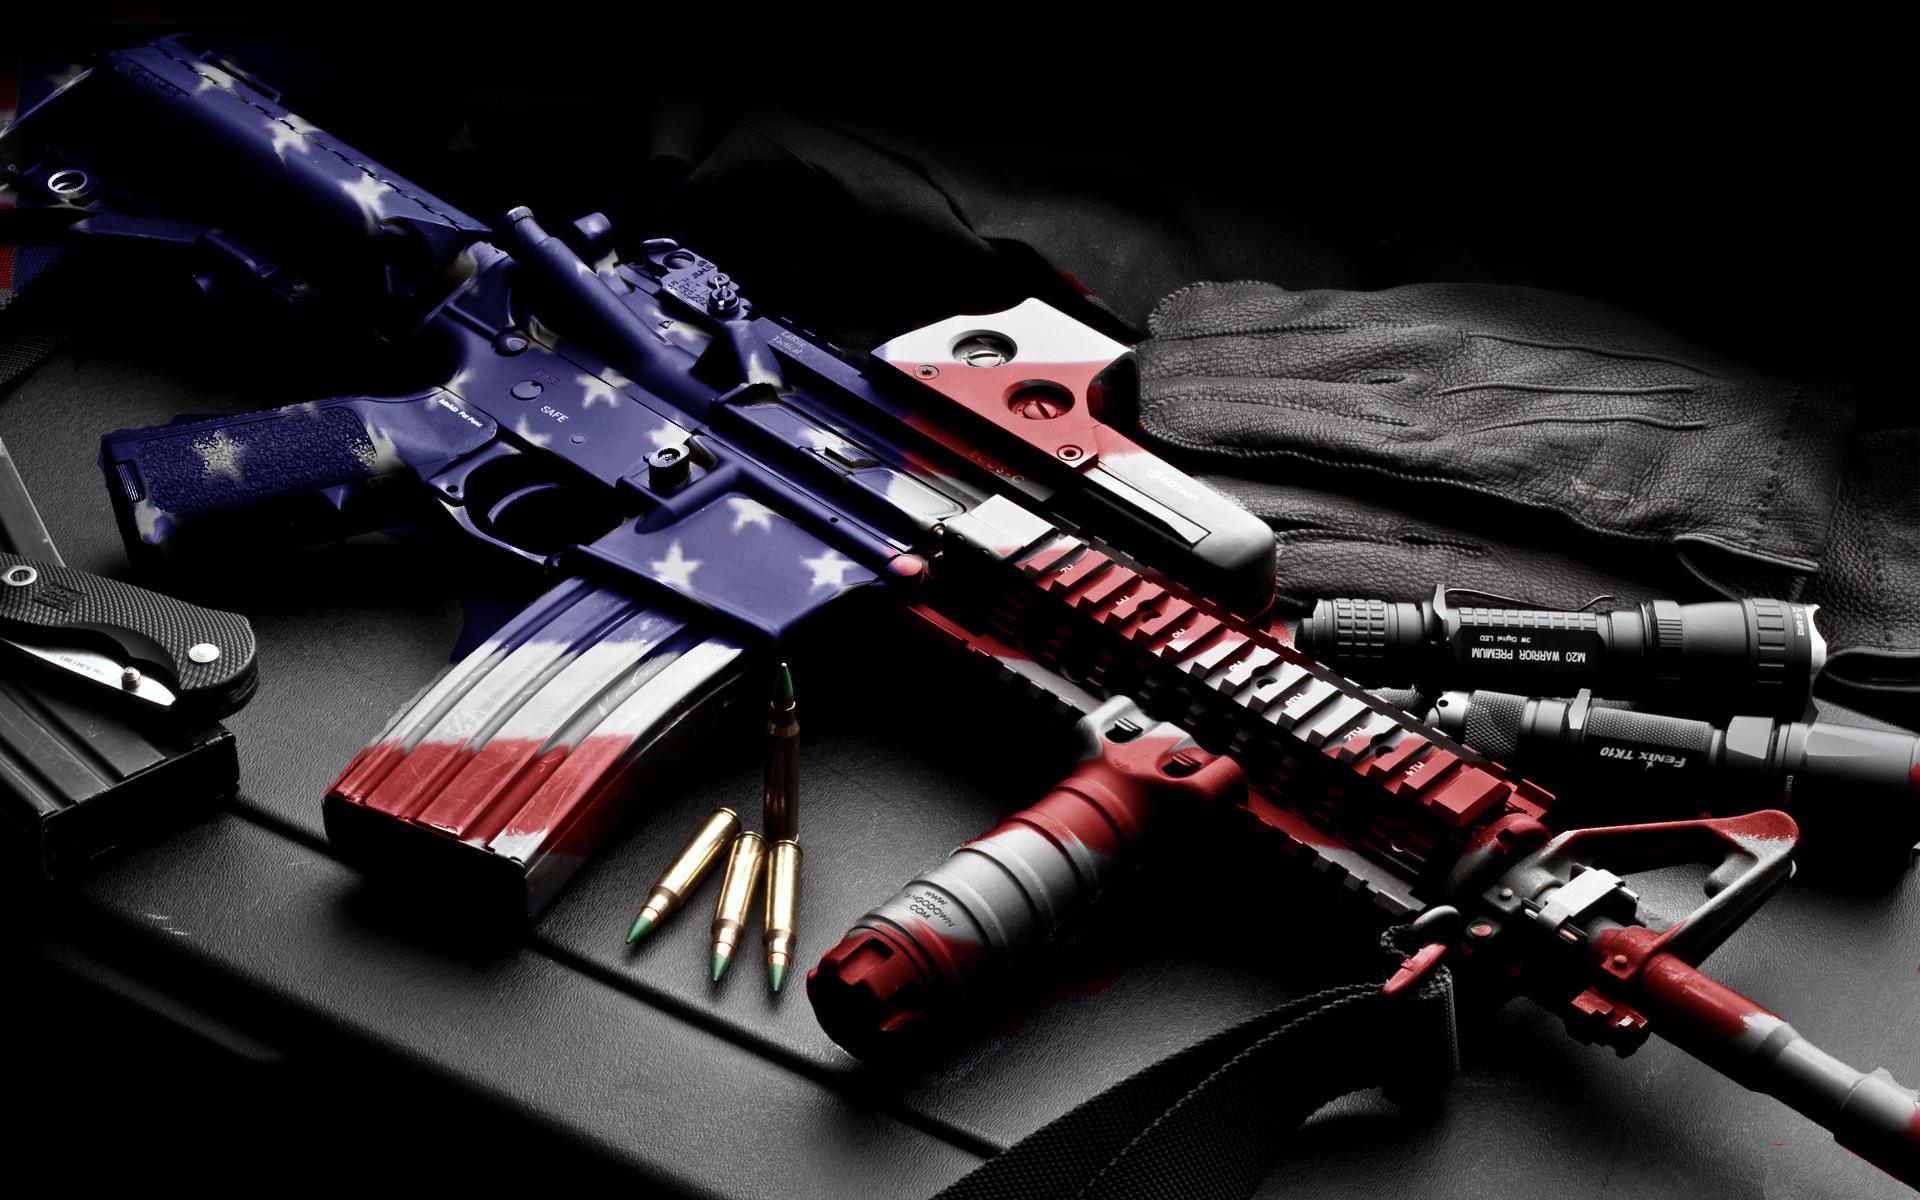 bullet ammo ammuntion flag wallpaper 1920x1200 28784 WallpaperUP 1920x1200